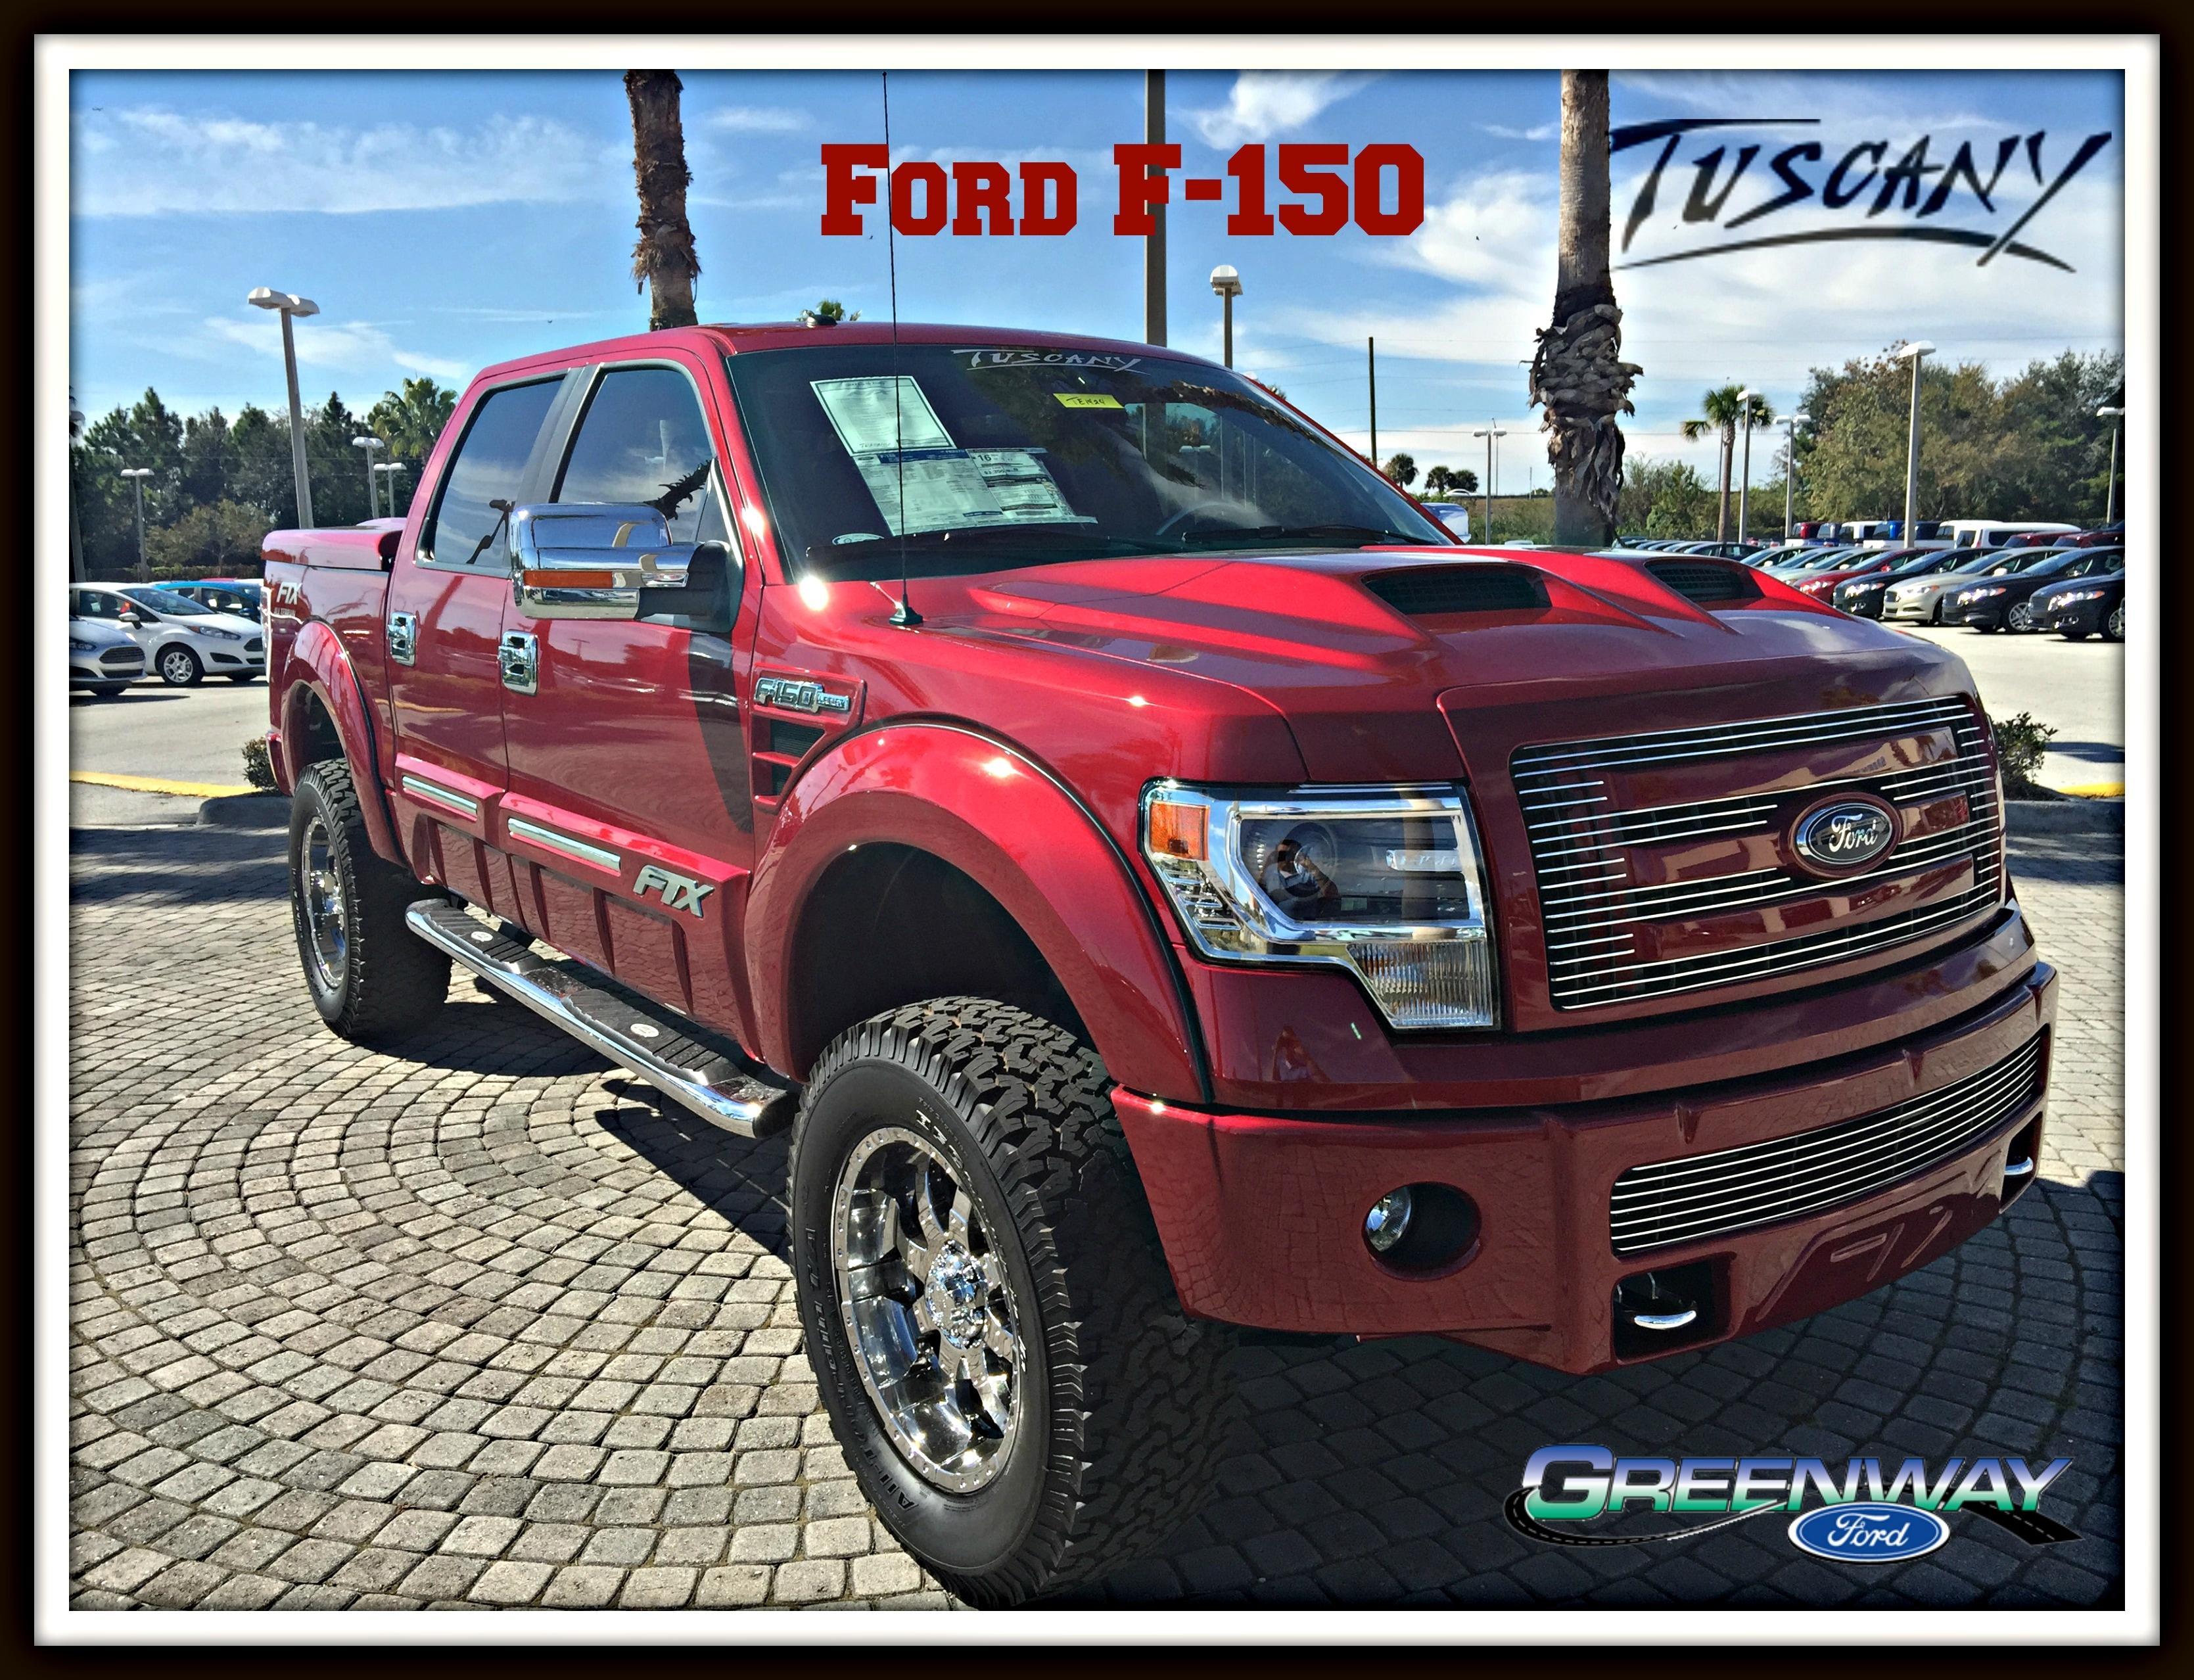 Greenway Ford | New Ford dealership in Orlando, FL 32817